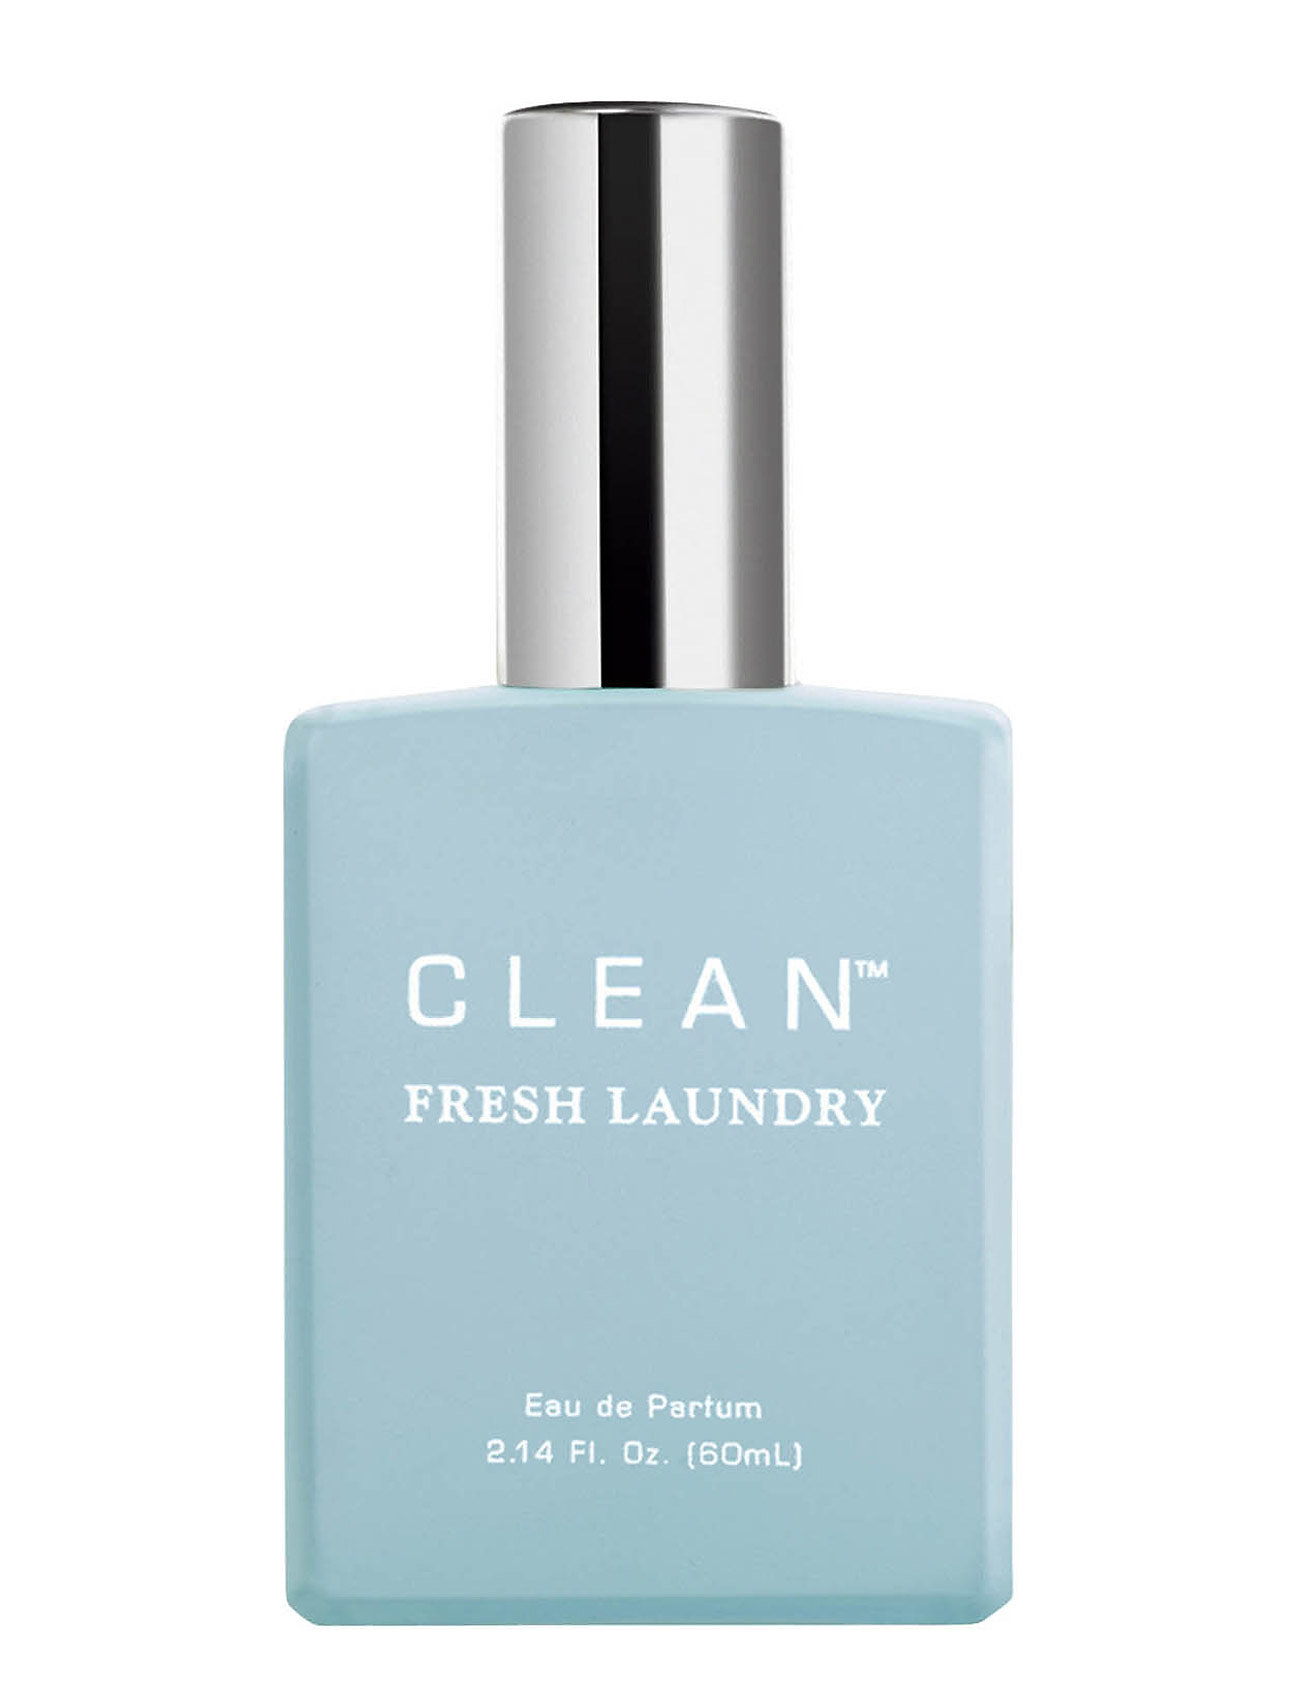 clean – Fresh laundry fra boozt.com dk